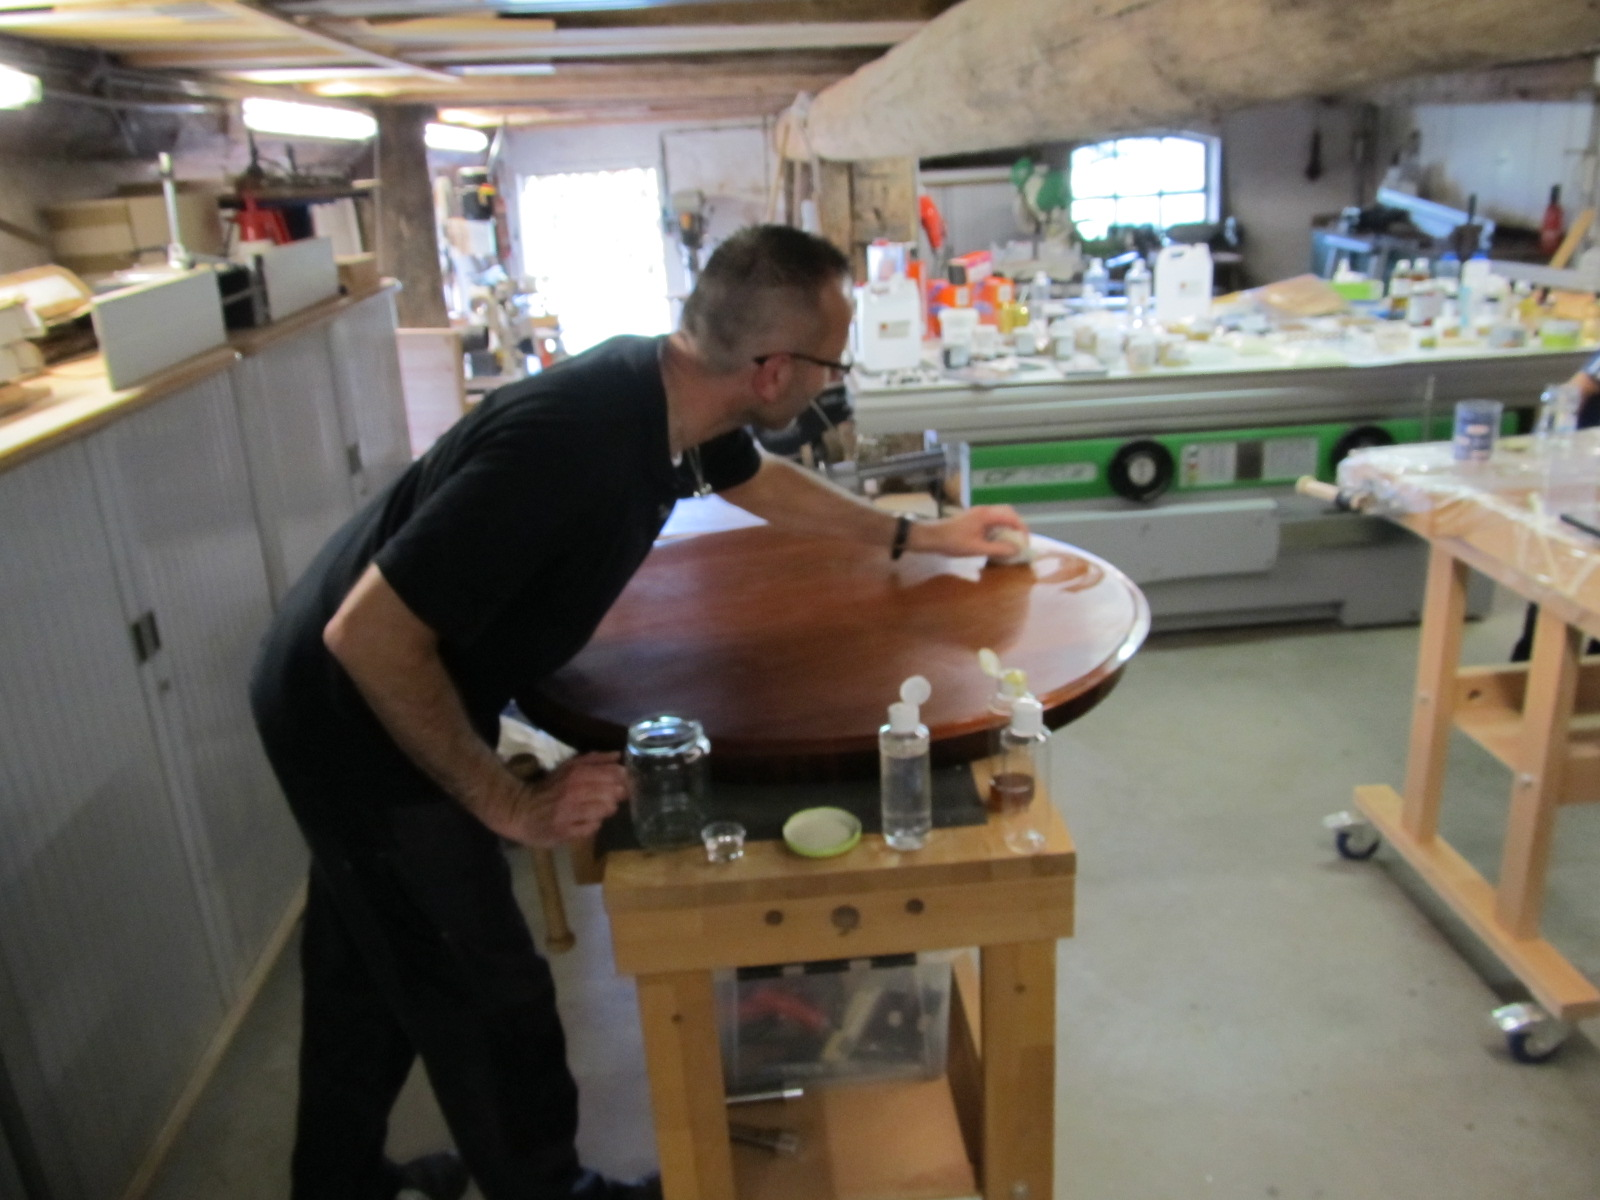 Cursus Meubels Opknappen : Oude meubels opknappen oude meubels opknappen